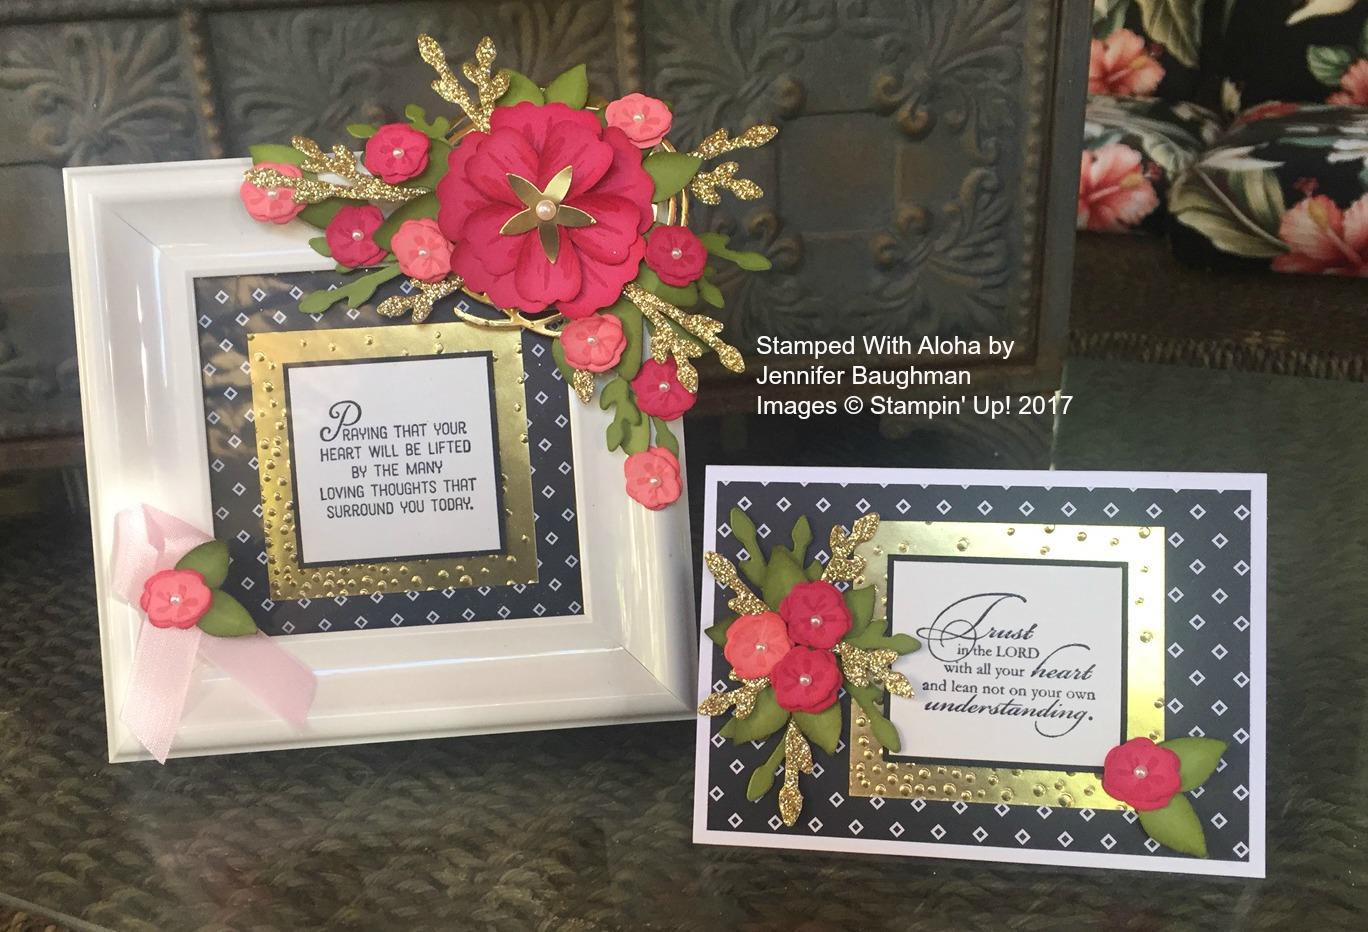 A beautiful gift - www.stampedwithaloha.com